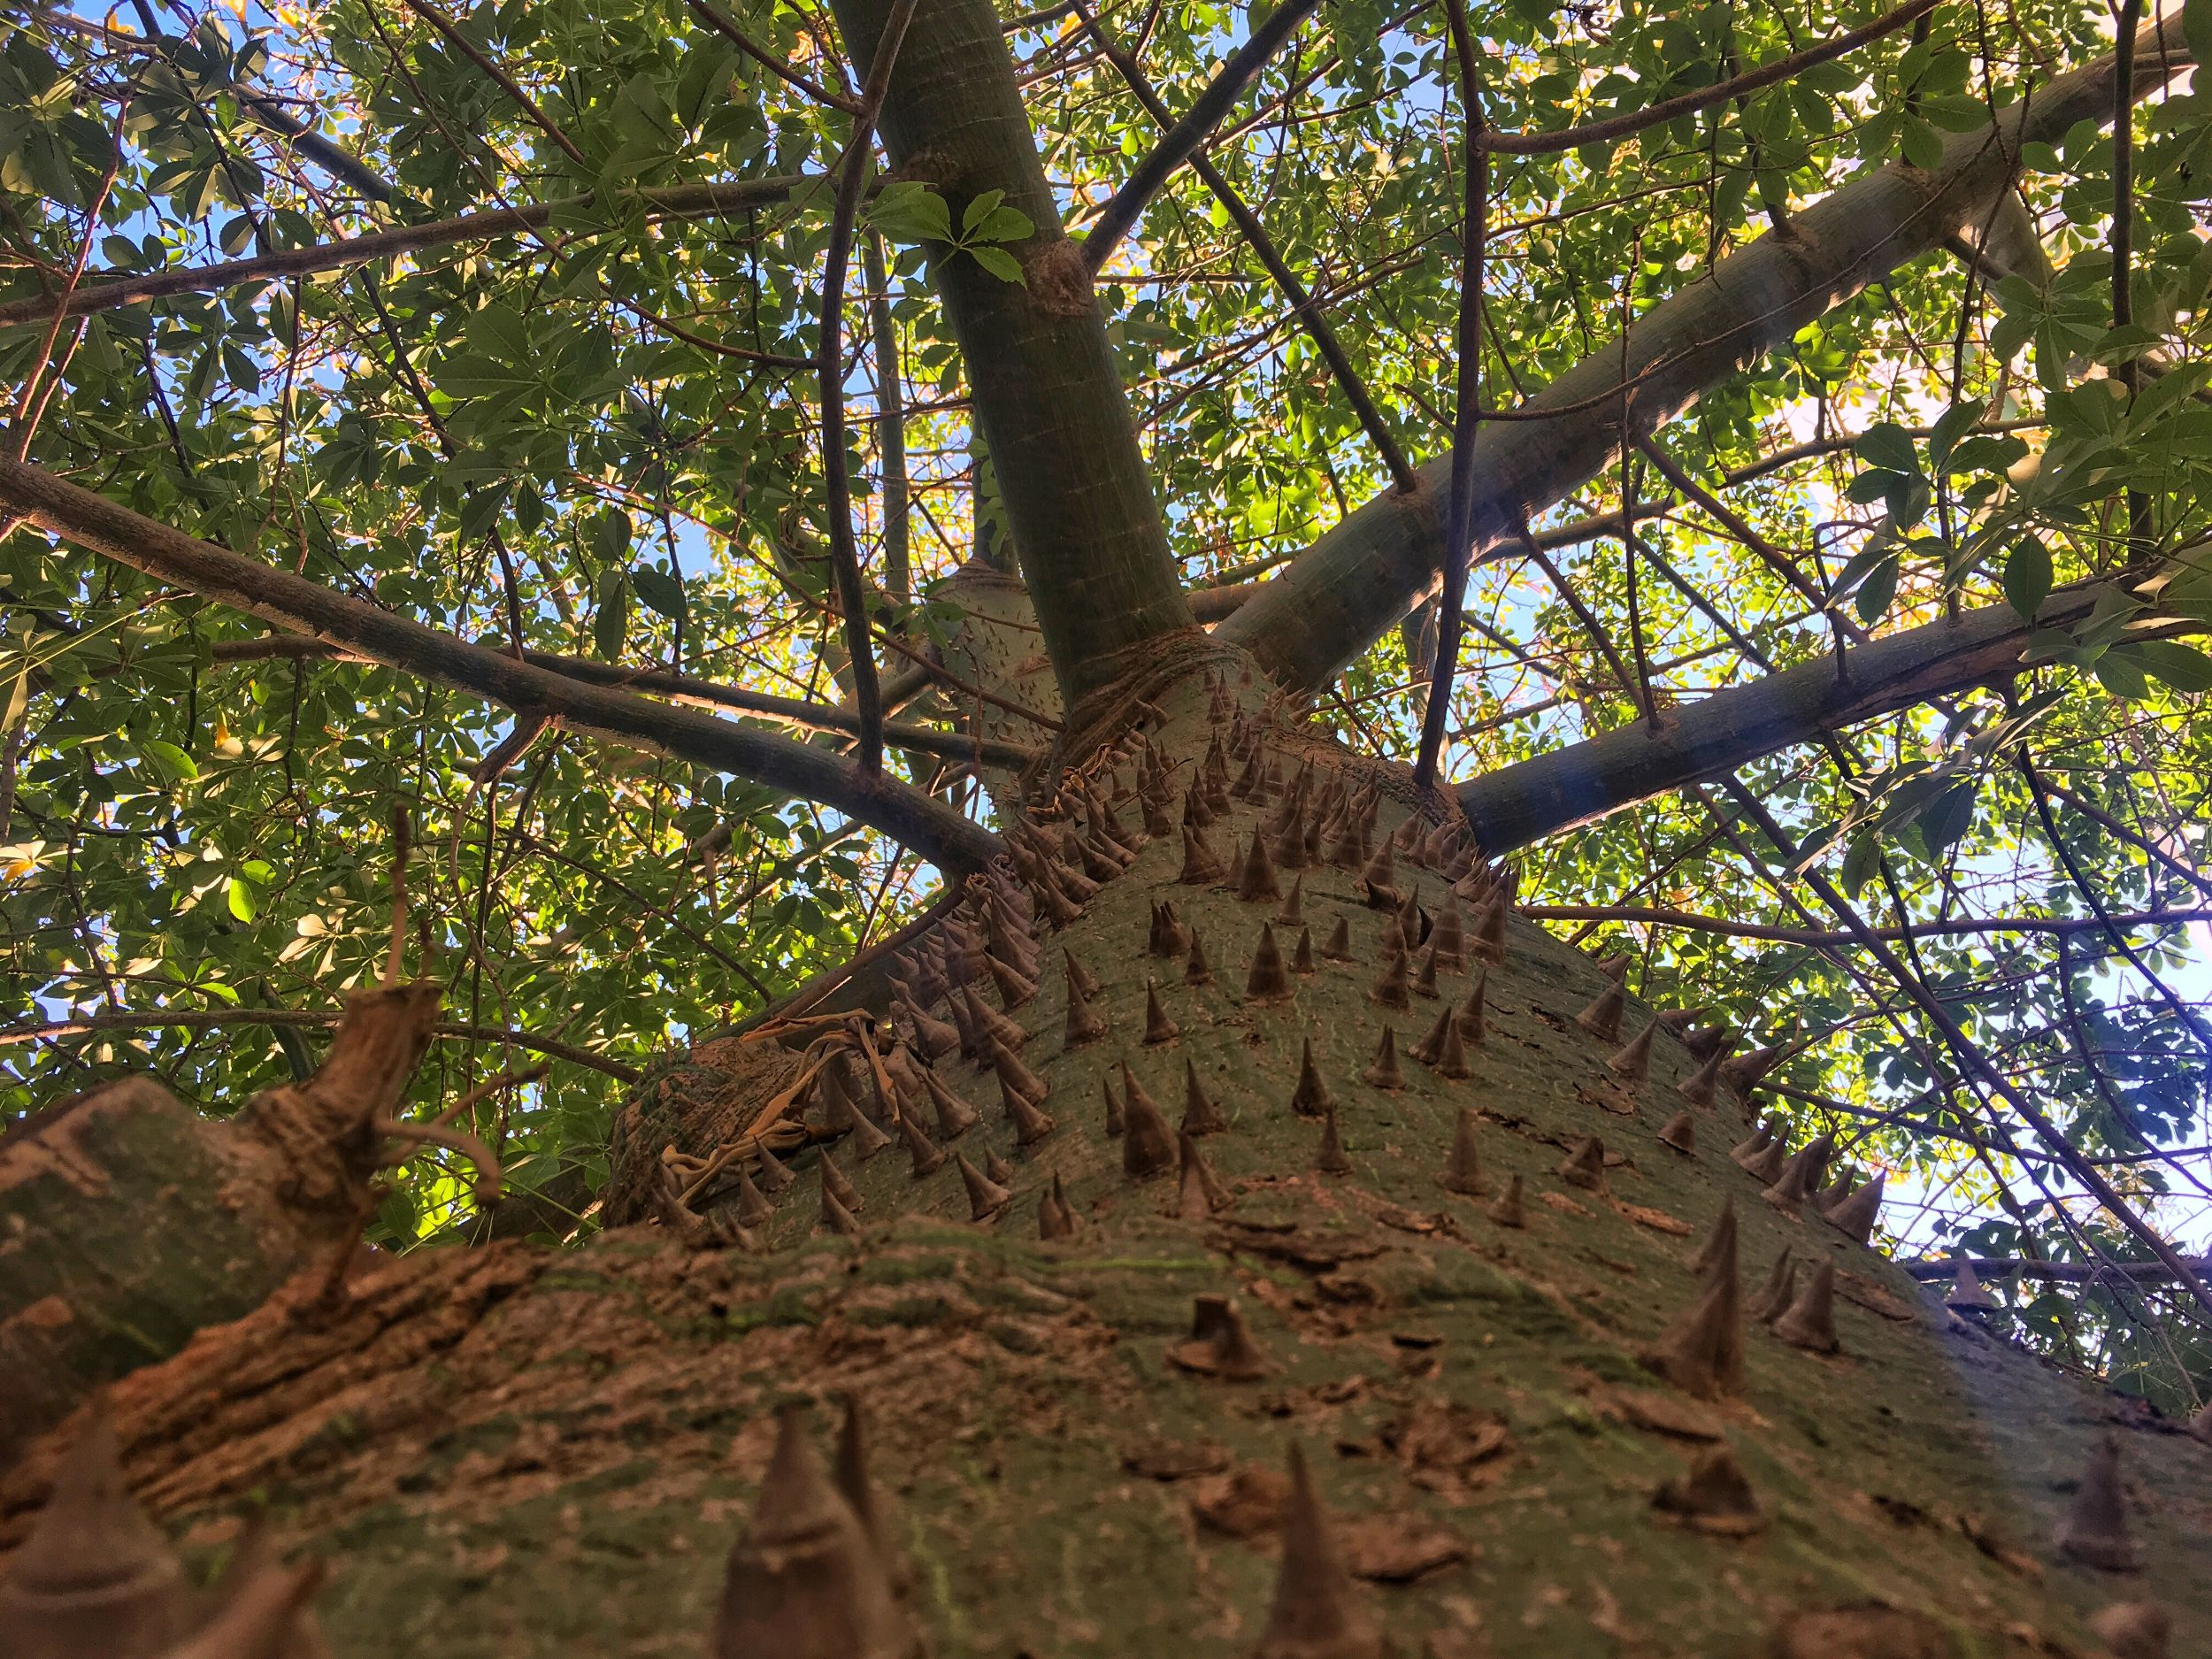 Looking along a Kapok Tree into the Canopy